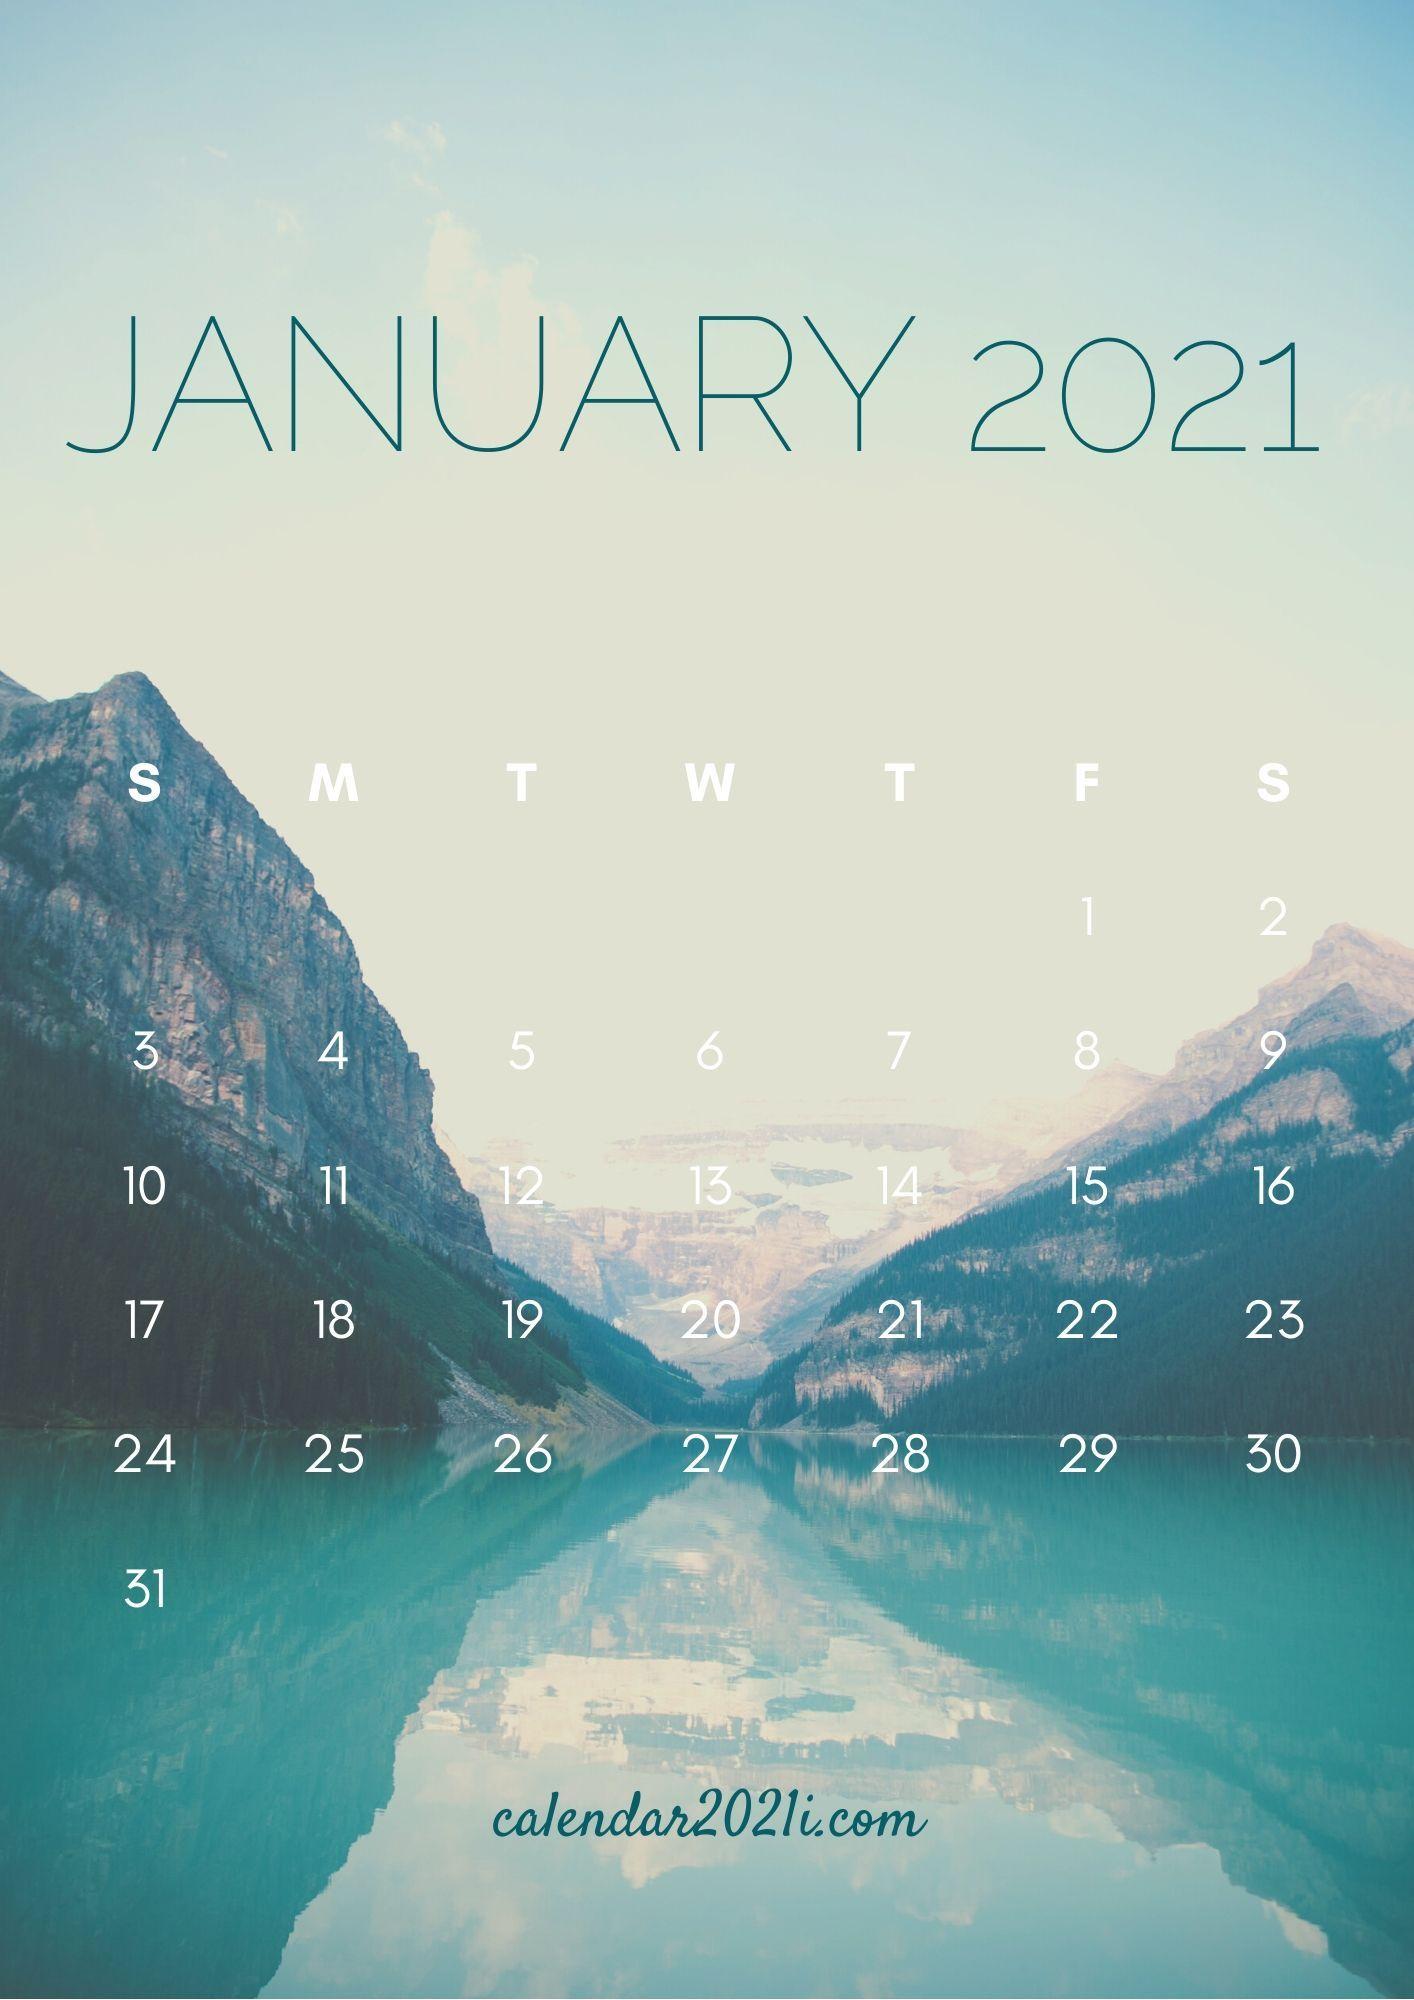 January 2021 Calendar iPhone HD Wallpaper for home screen